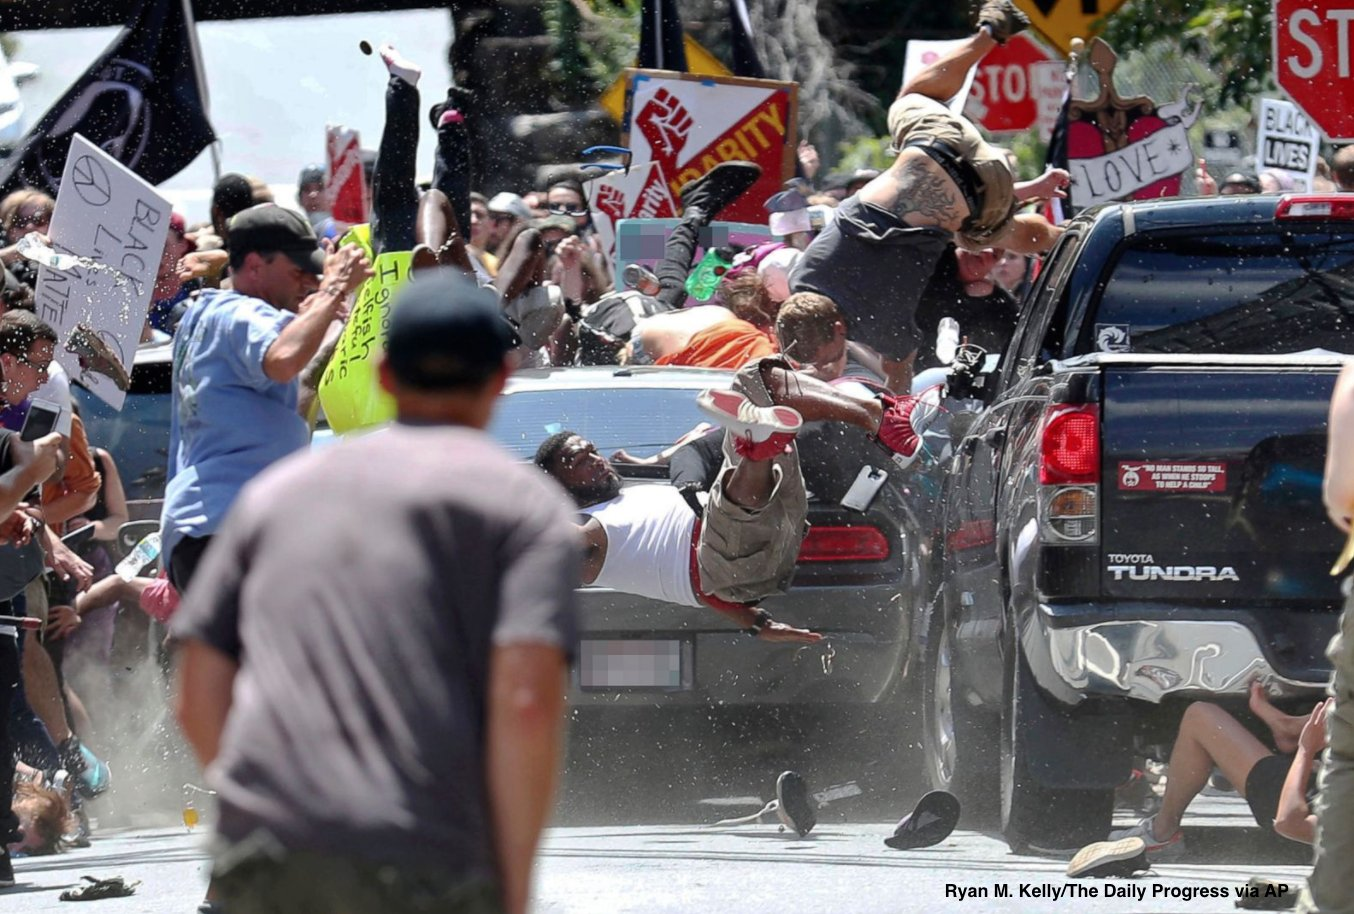 Horrifying images emerge from violent day in #Charlottesville. https://t.co/vXY37csI4G https://t.co/zxNP49D77g